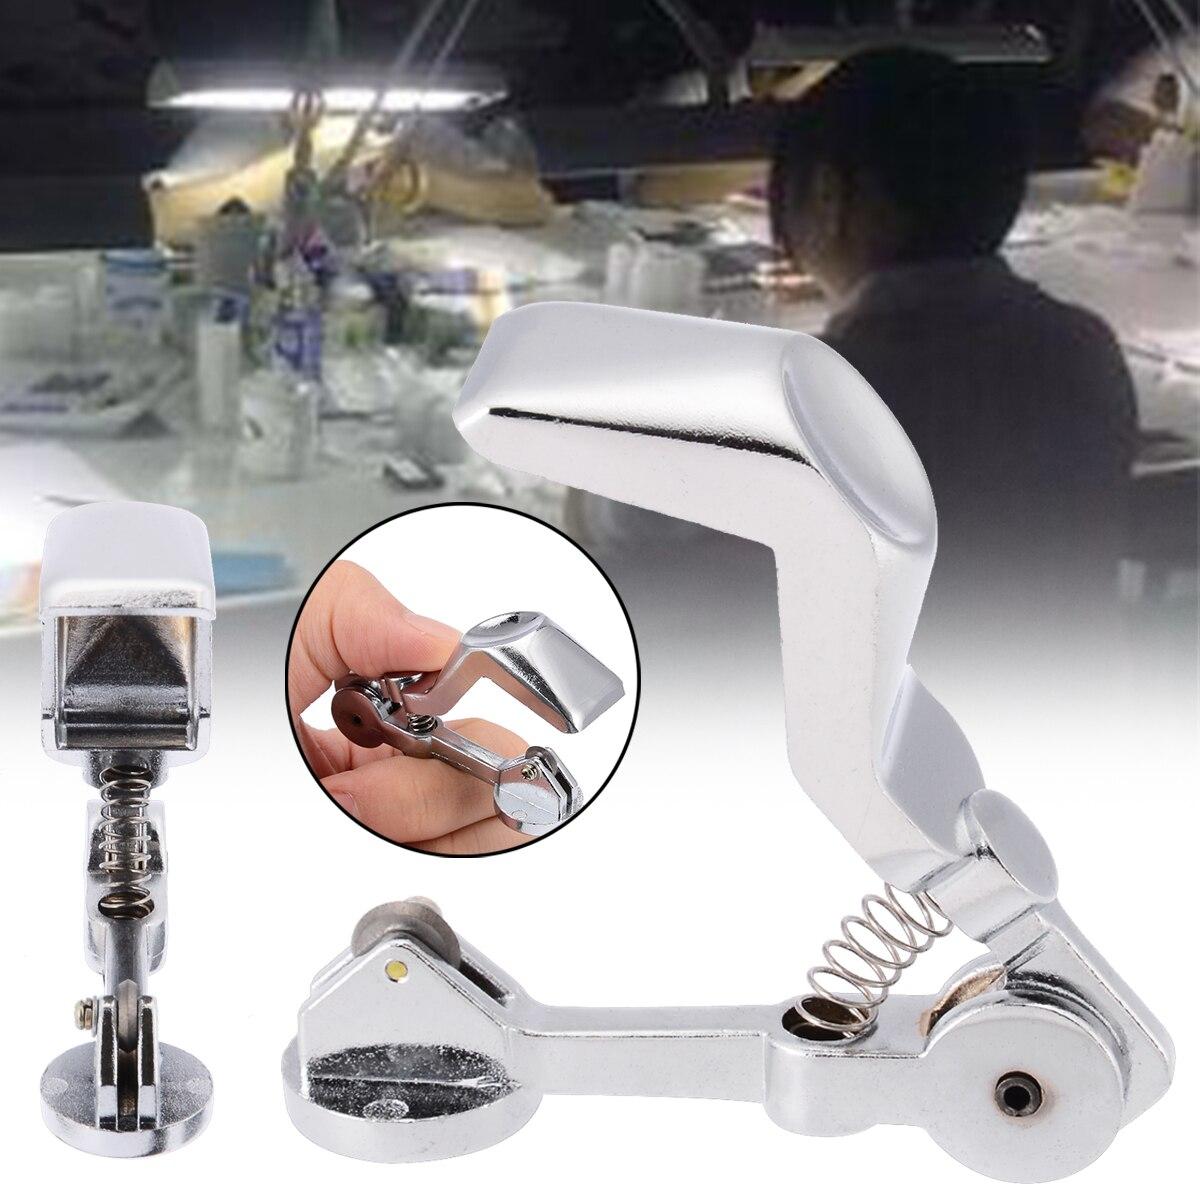 New Metal Glass Tubing Cutter DIY Lamp Stain Glass Wine Beer Bottle Cutter Machine Bottle Jar Cutting Construction Tool